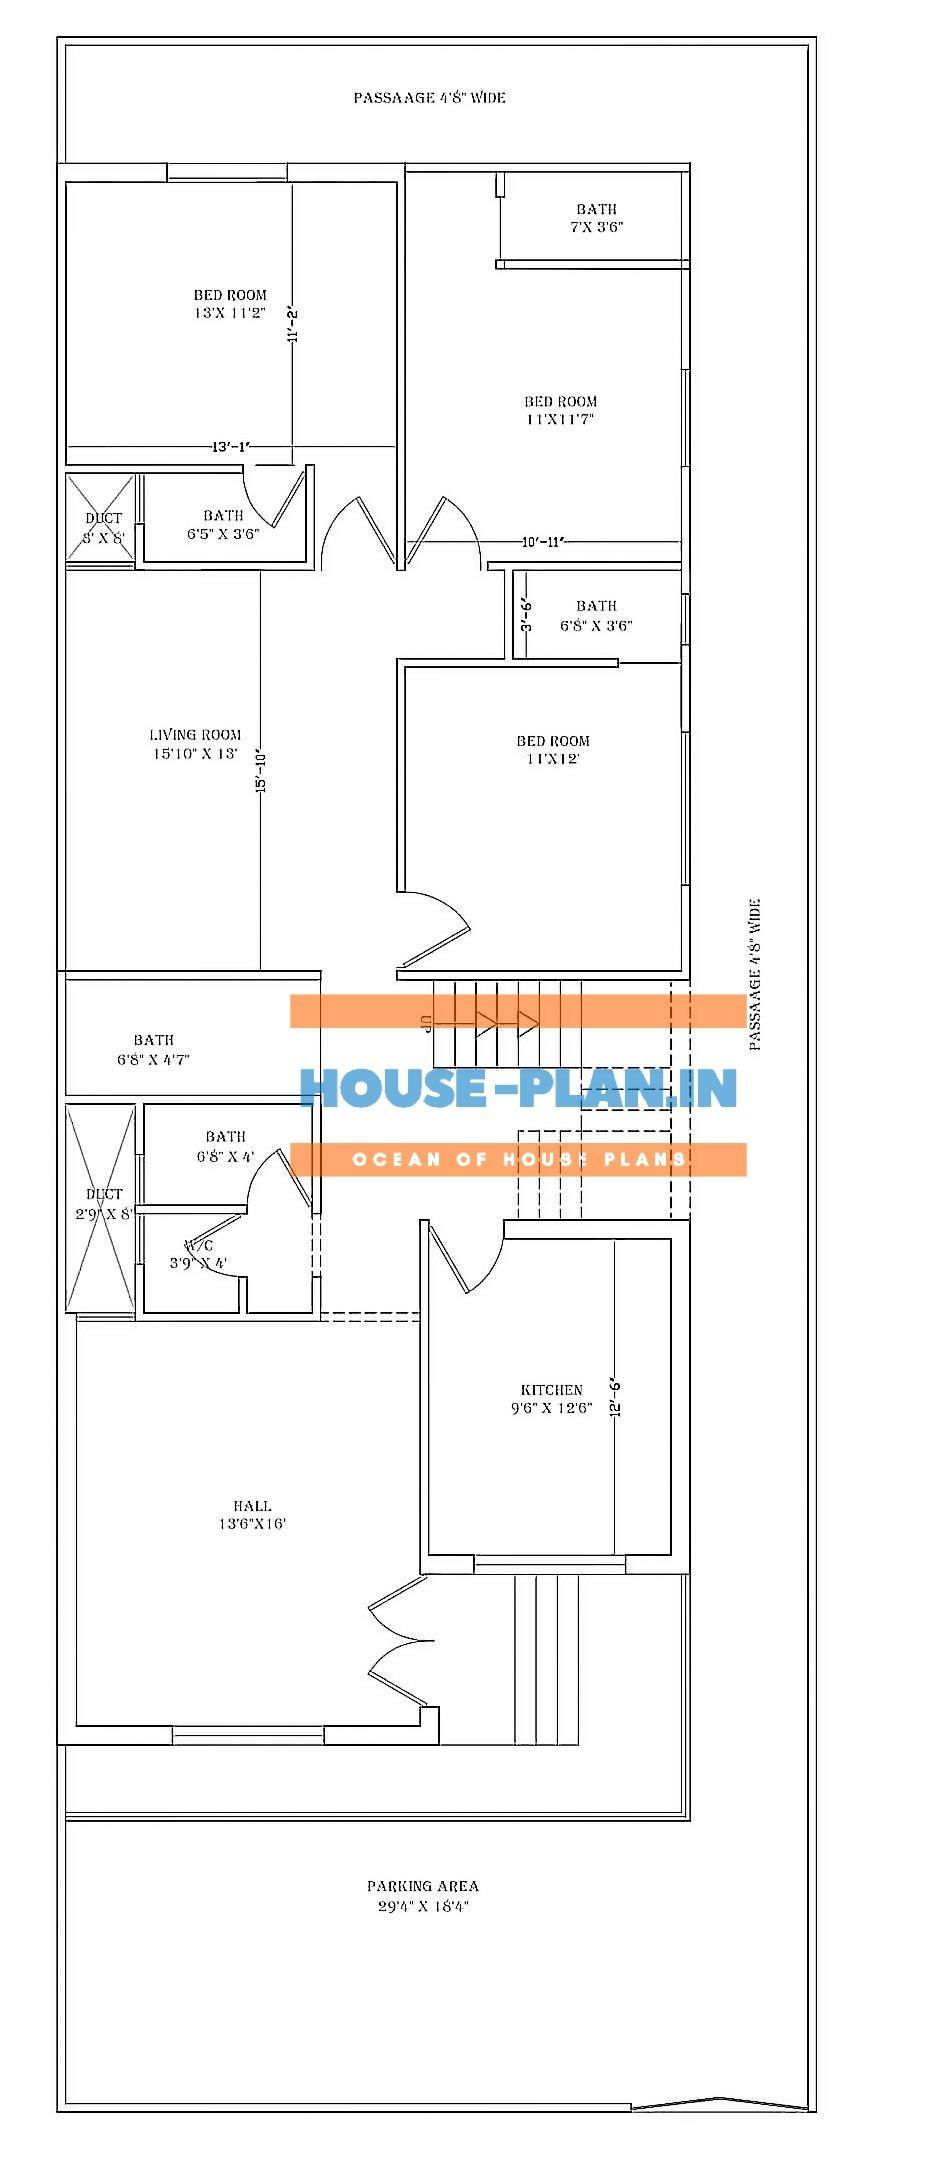 south facing house plan with vastu